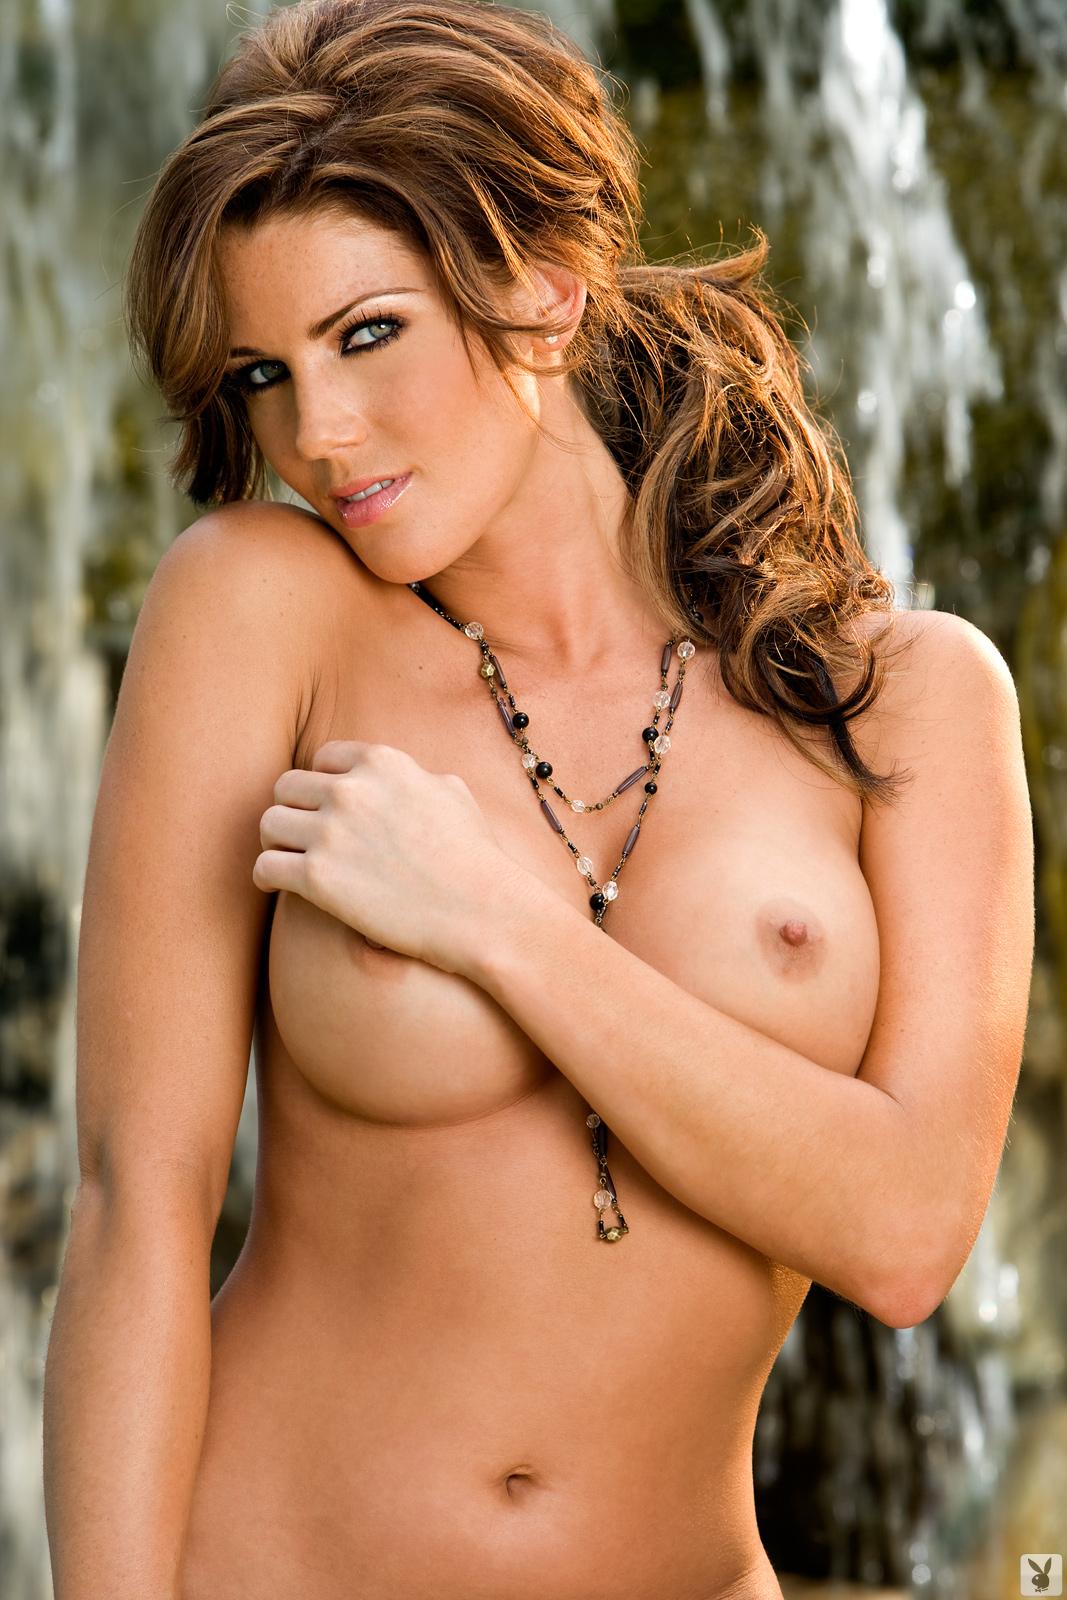 from Vihaan crystal mccahill playboy nude